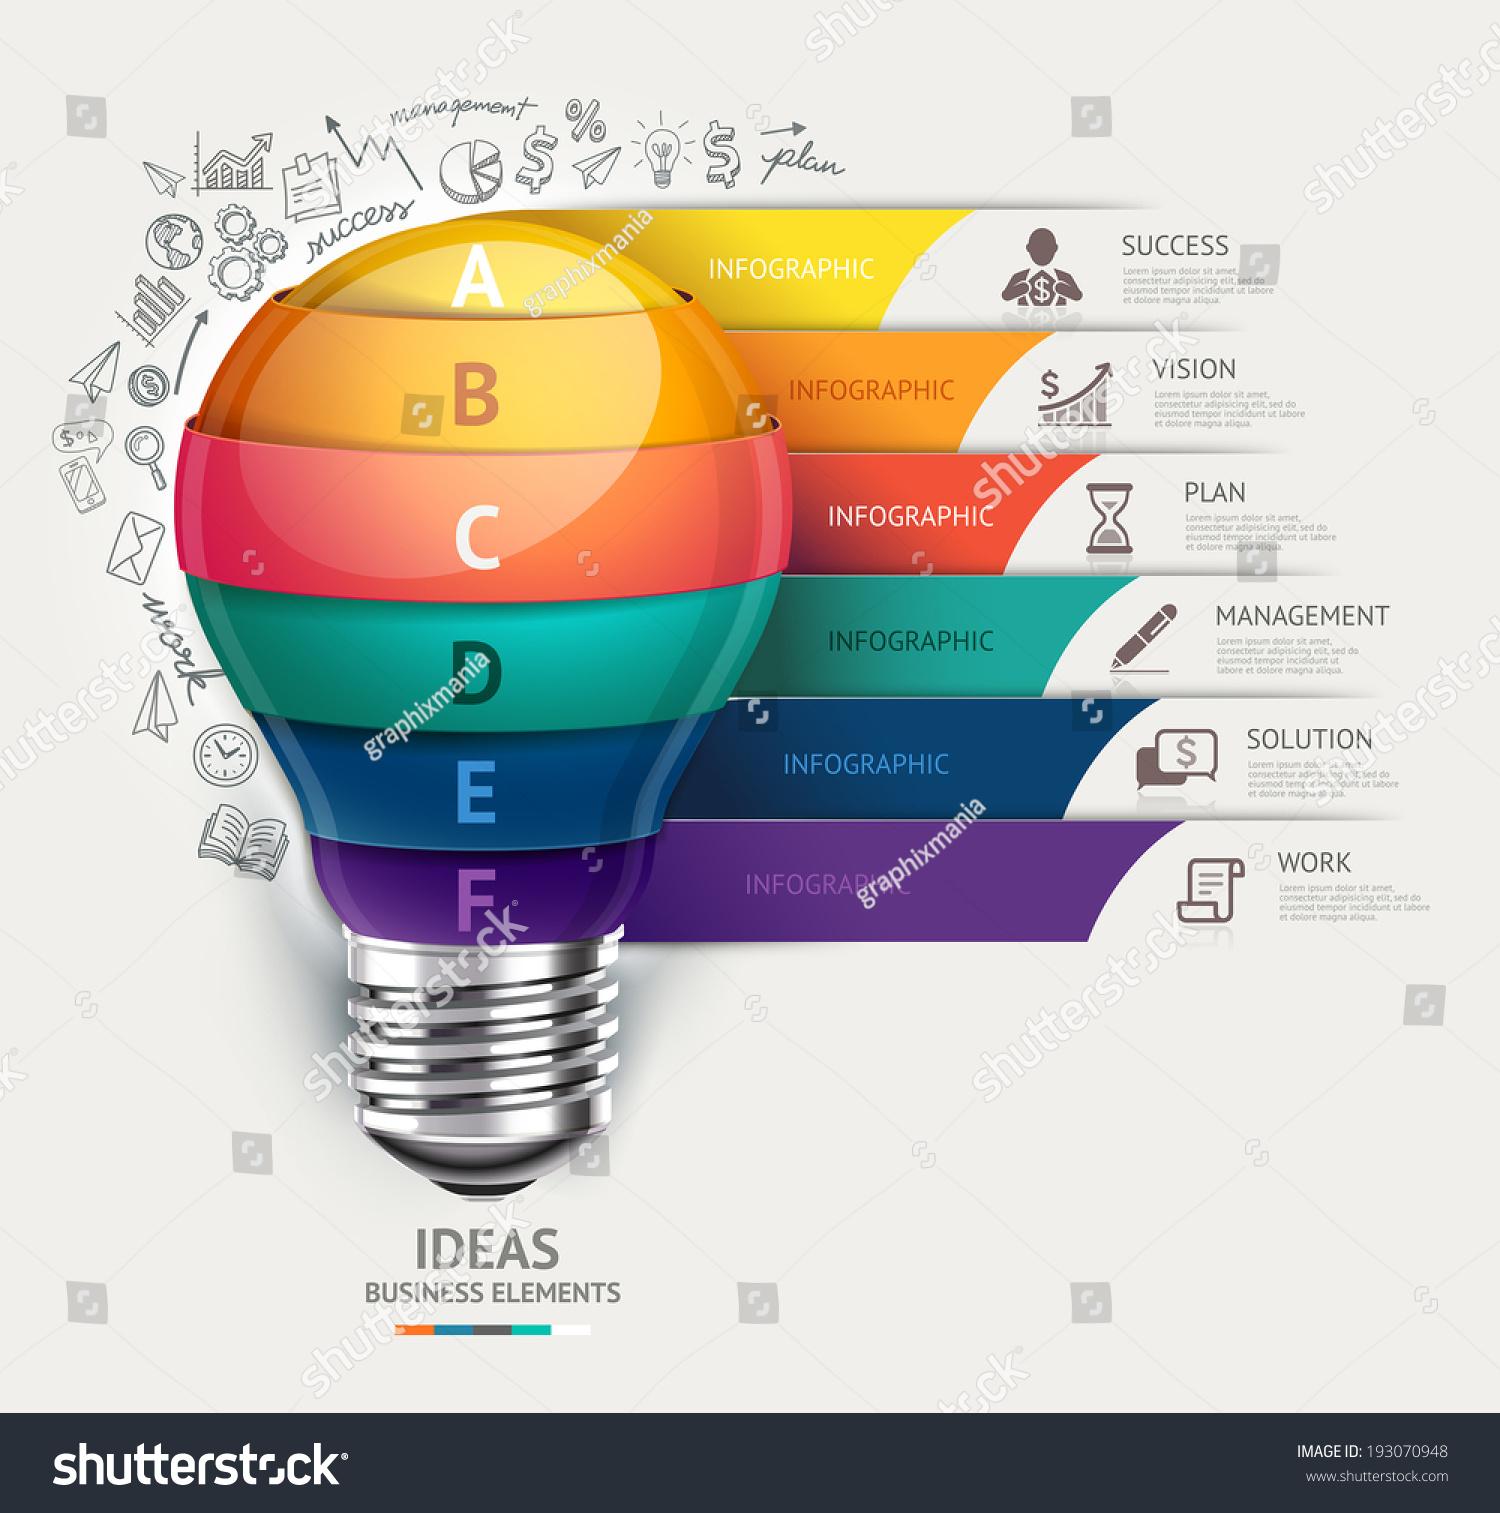 Business Concept Infographic Template Lightbulb Doodles Stock ...